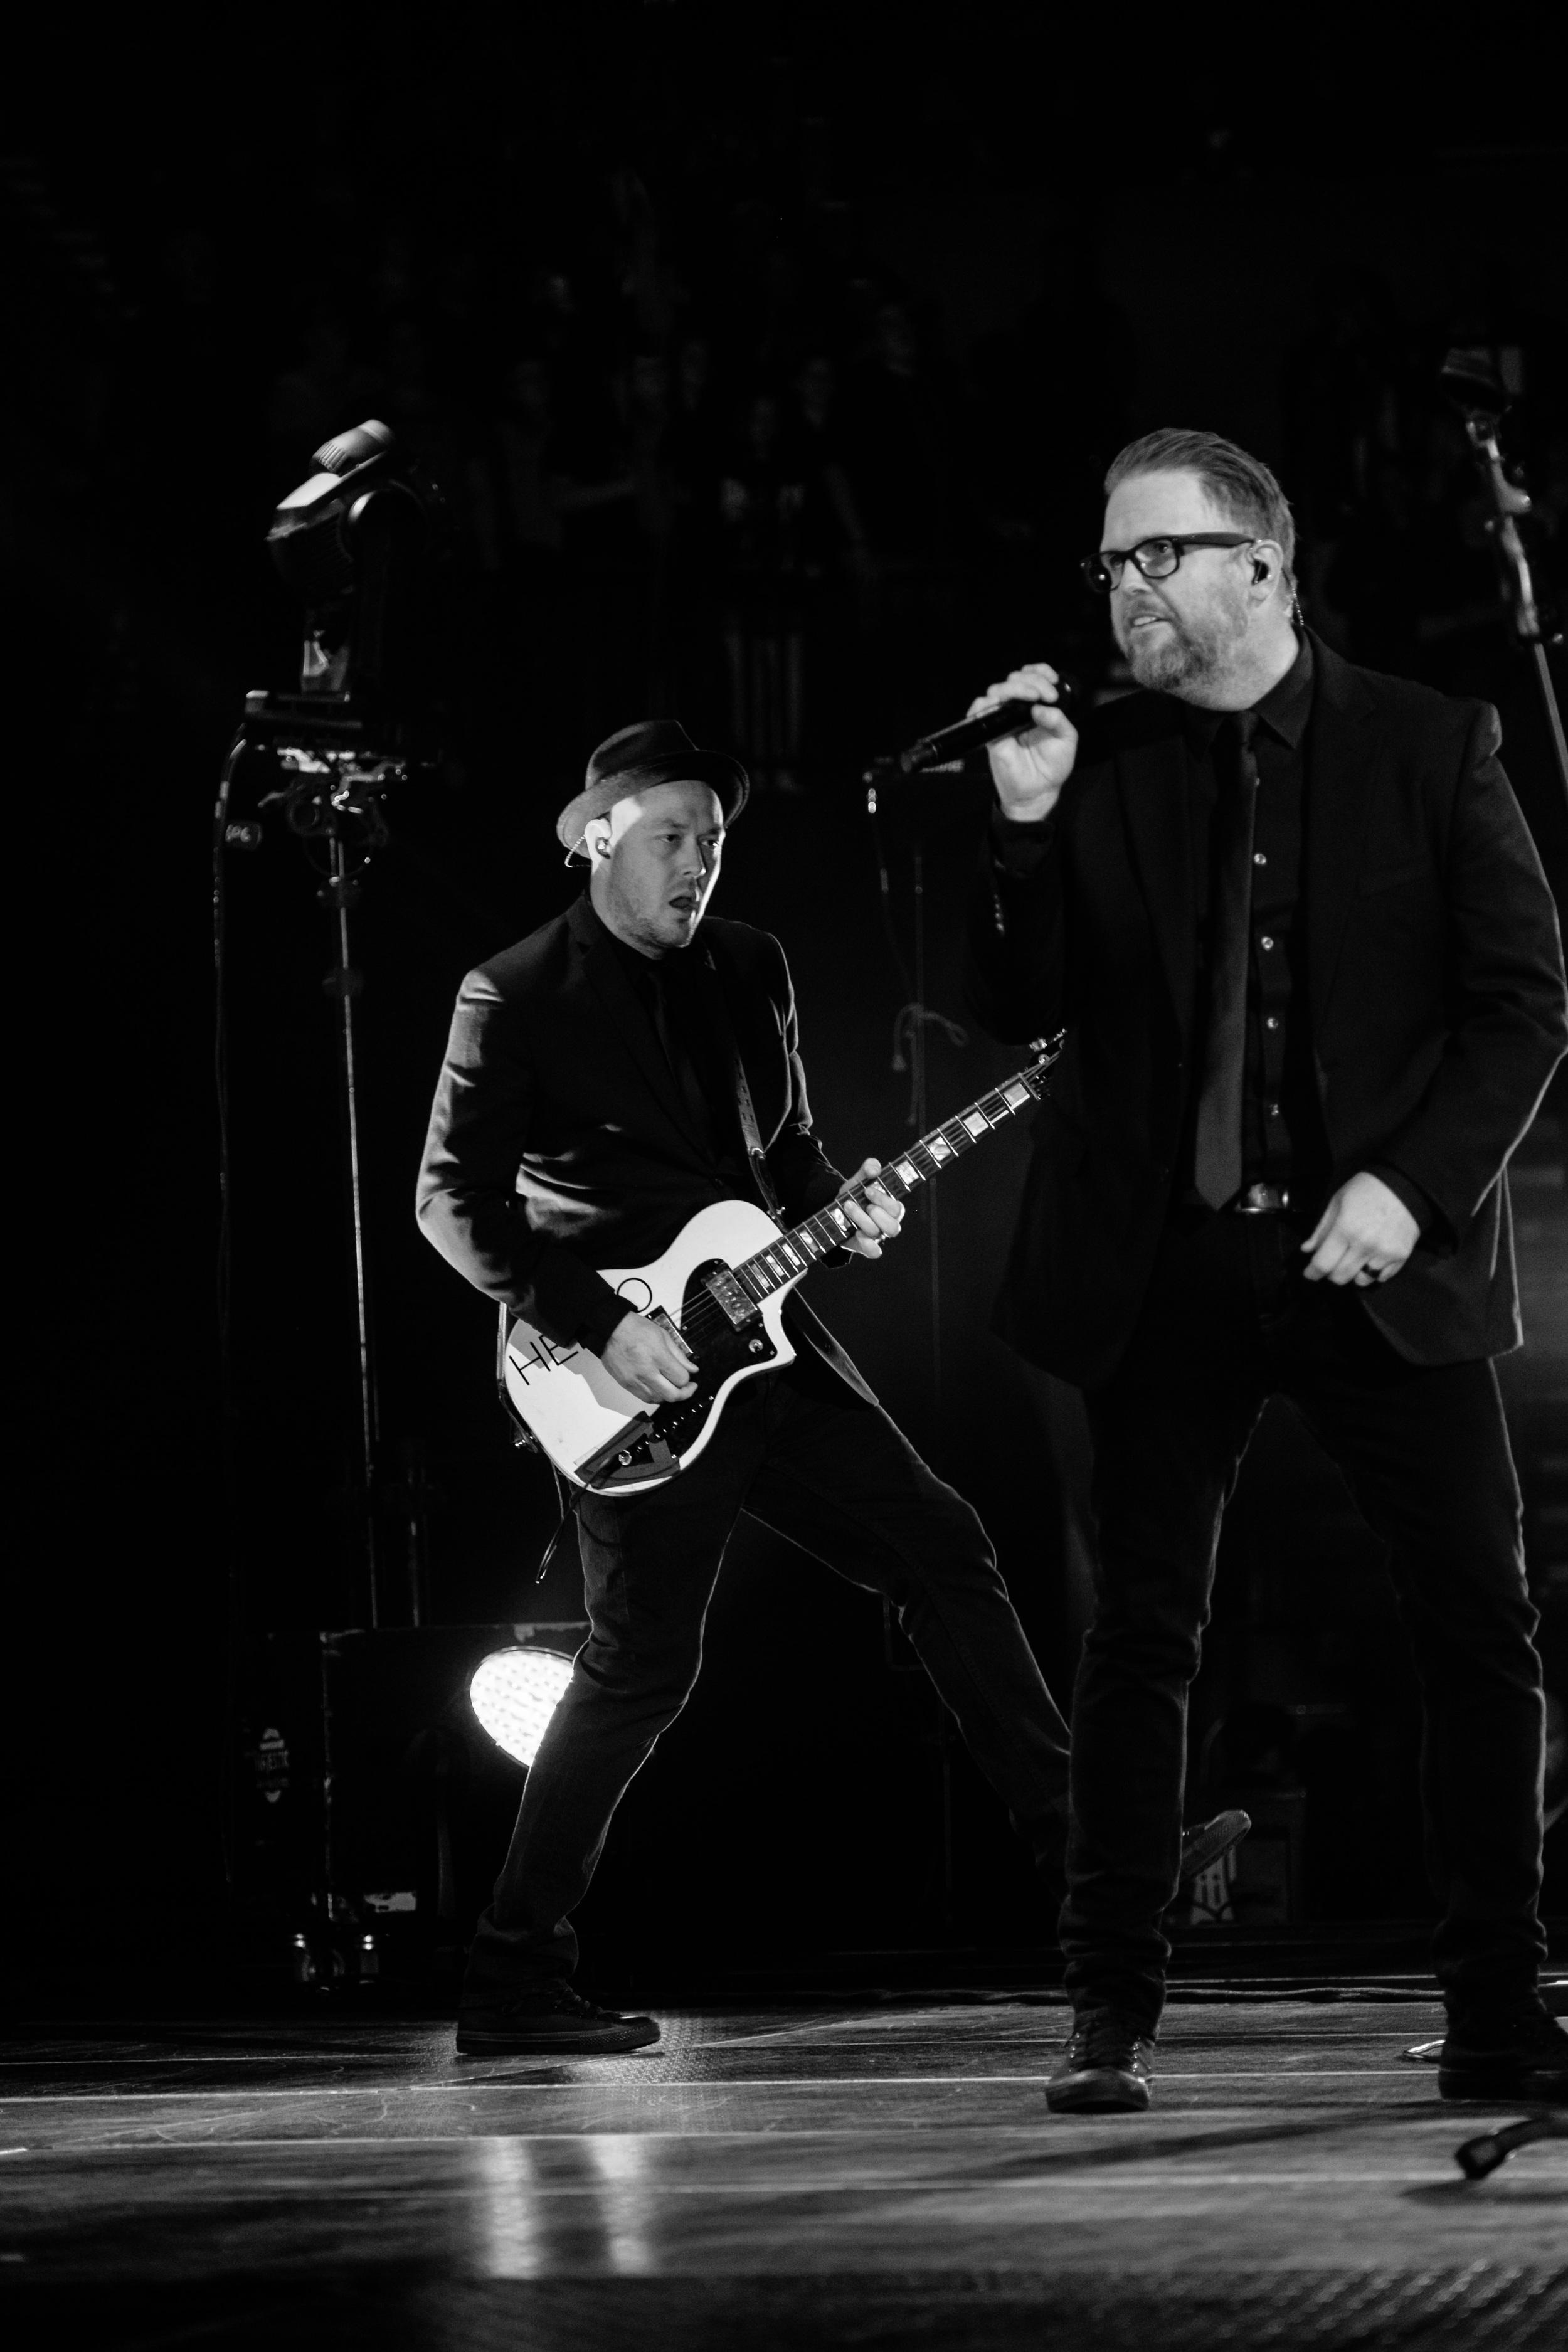 Rock_Worship_Roadshow-72.jpg